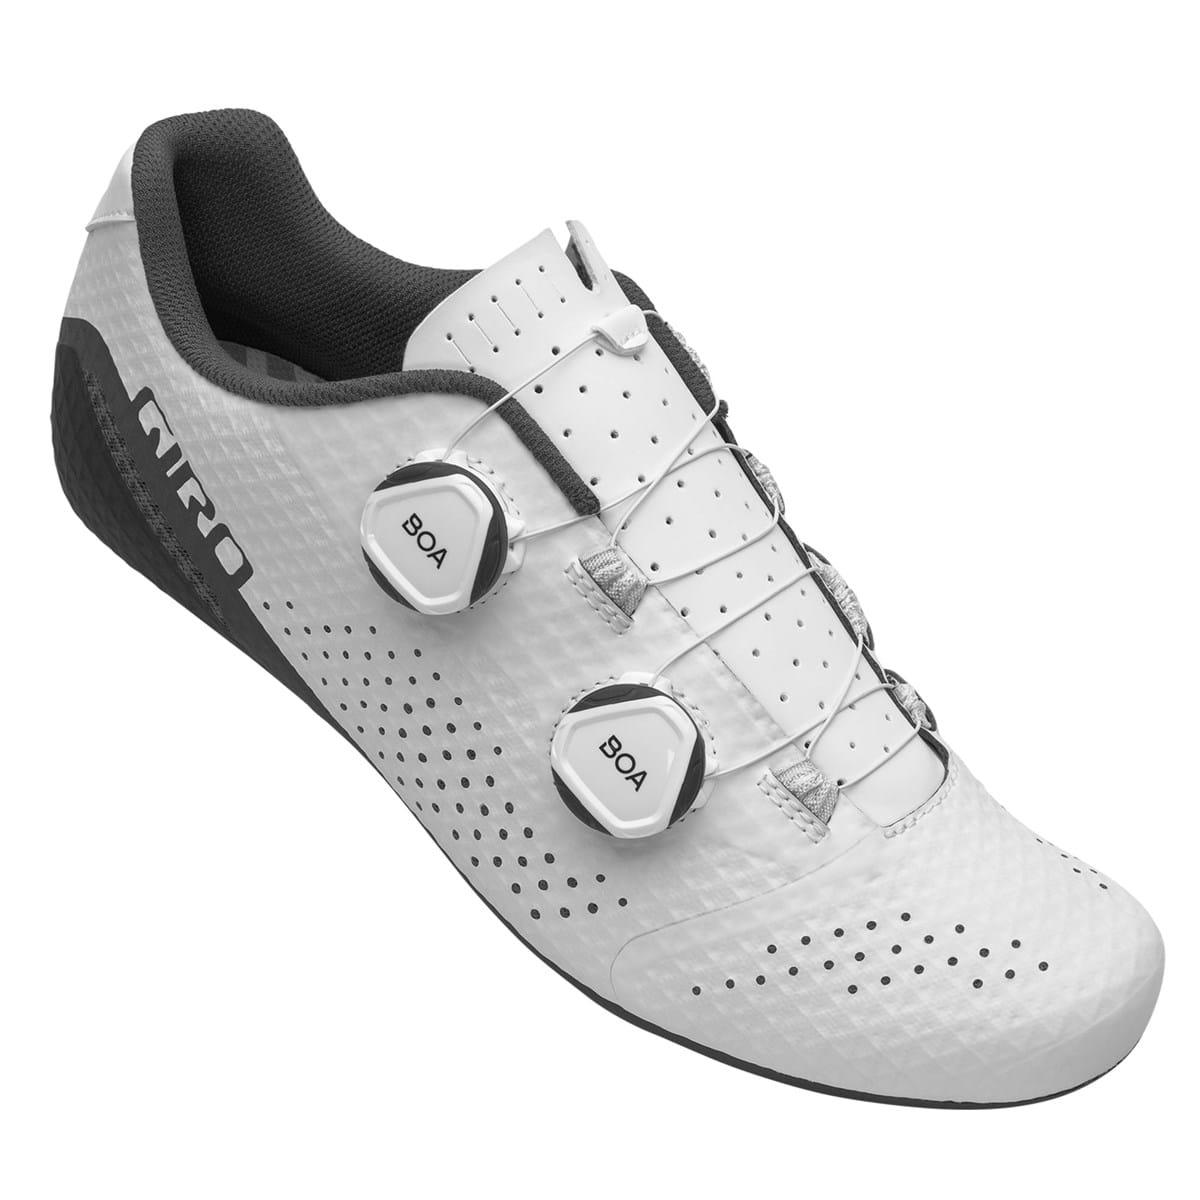 Regime Women's Road Cycling Shoes